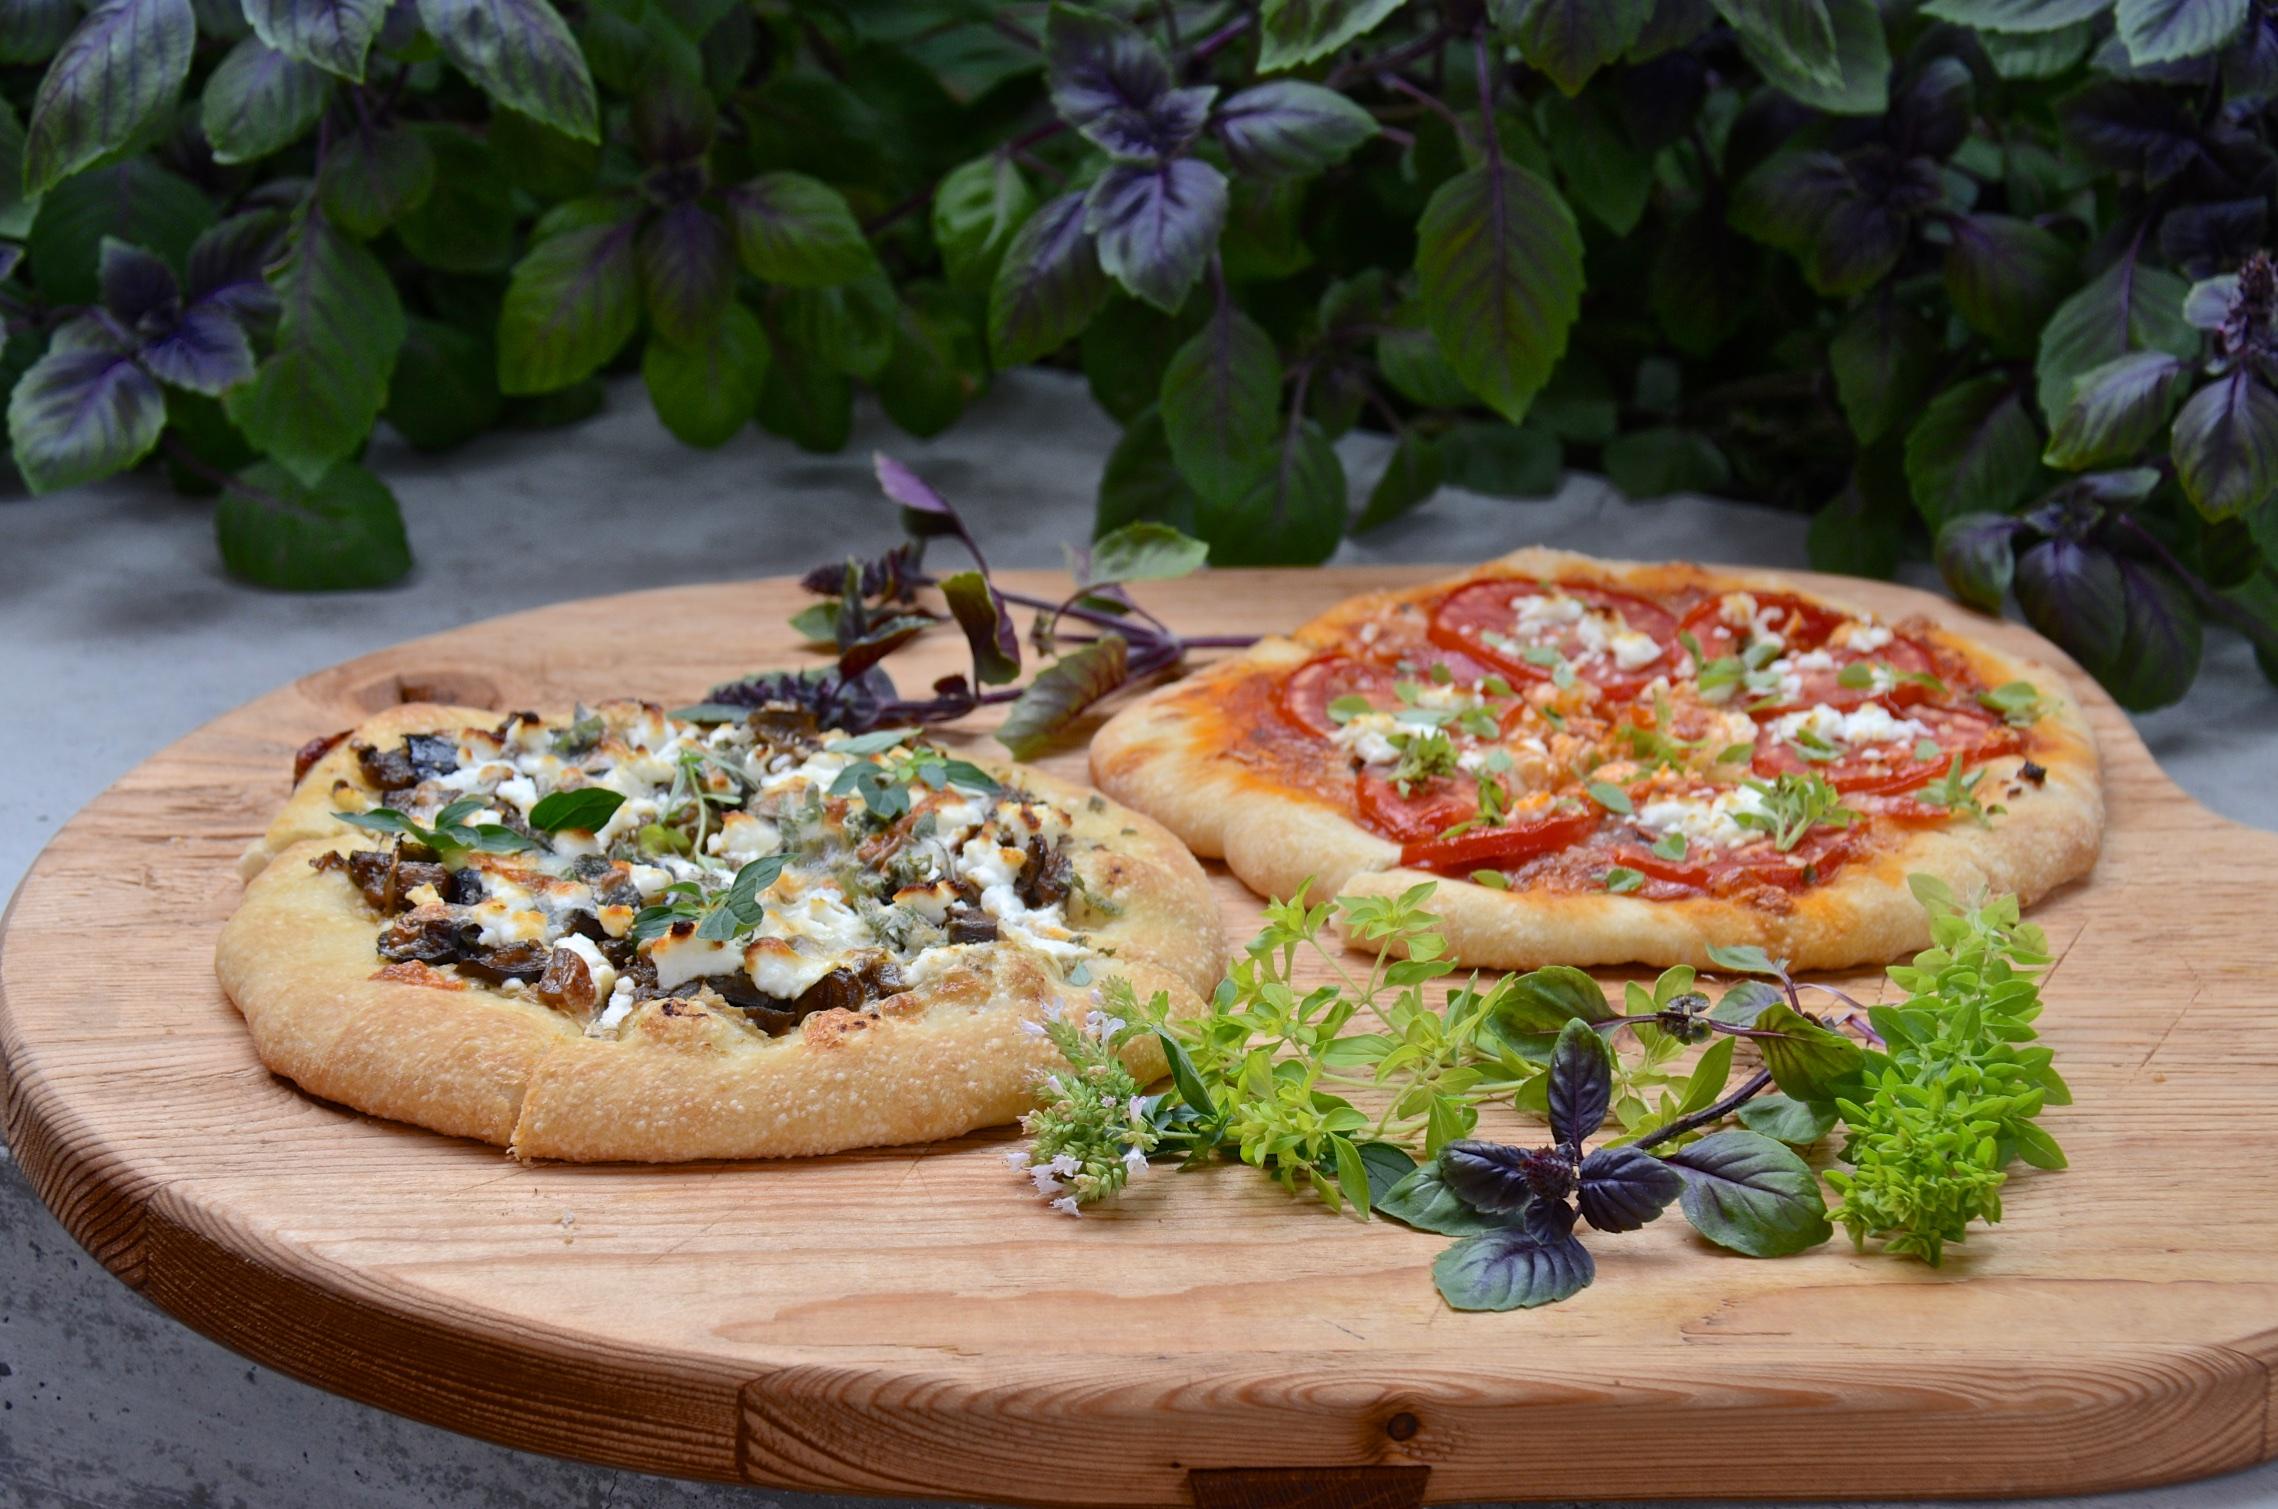 Pizza night mushroom pizza tomato pizza olive oil and lemons dina honke - Pizzeria venecia marbella ...